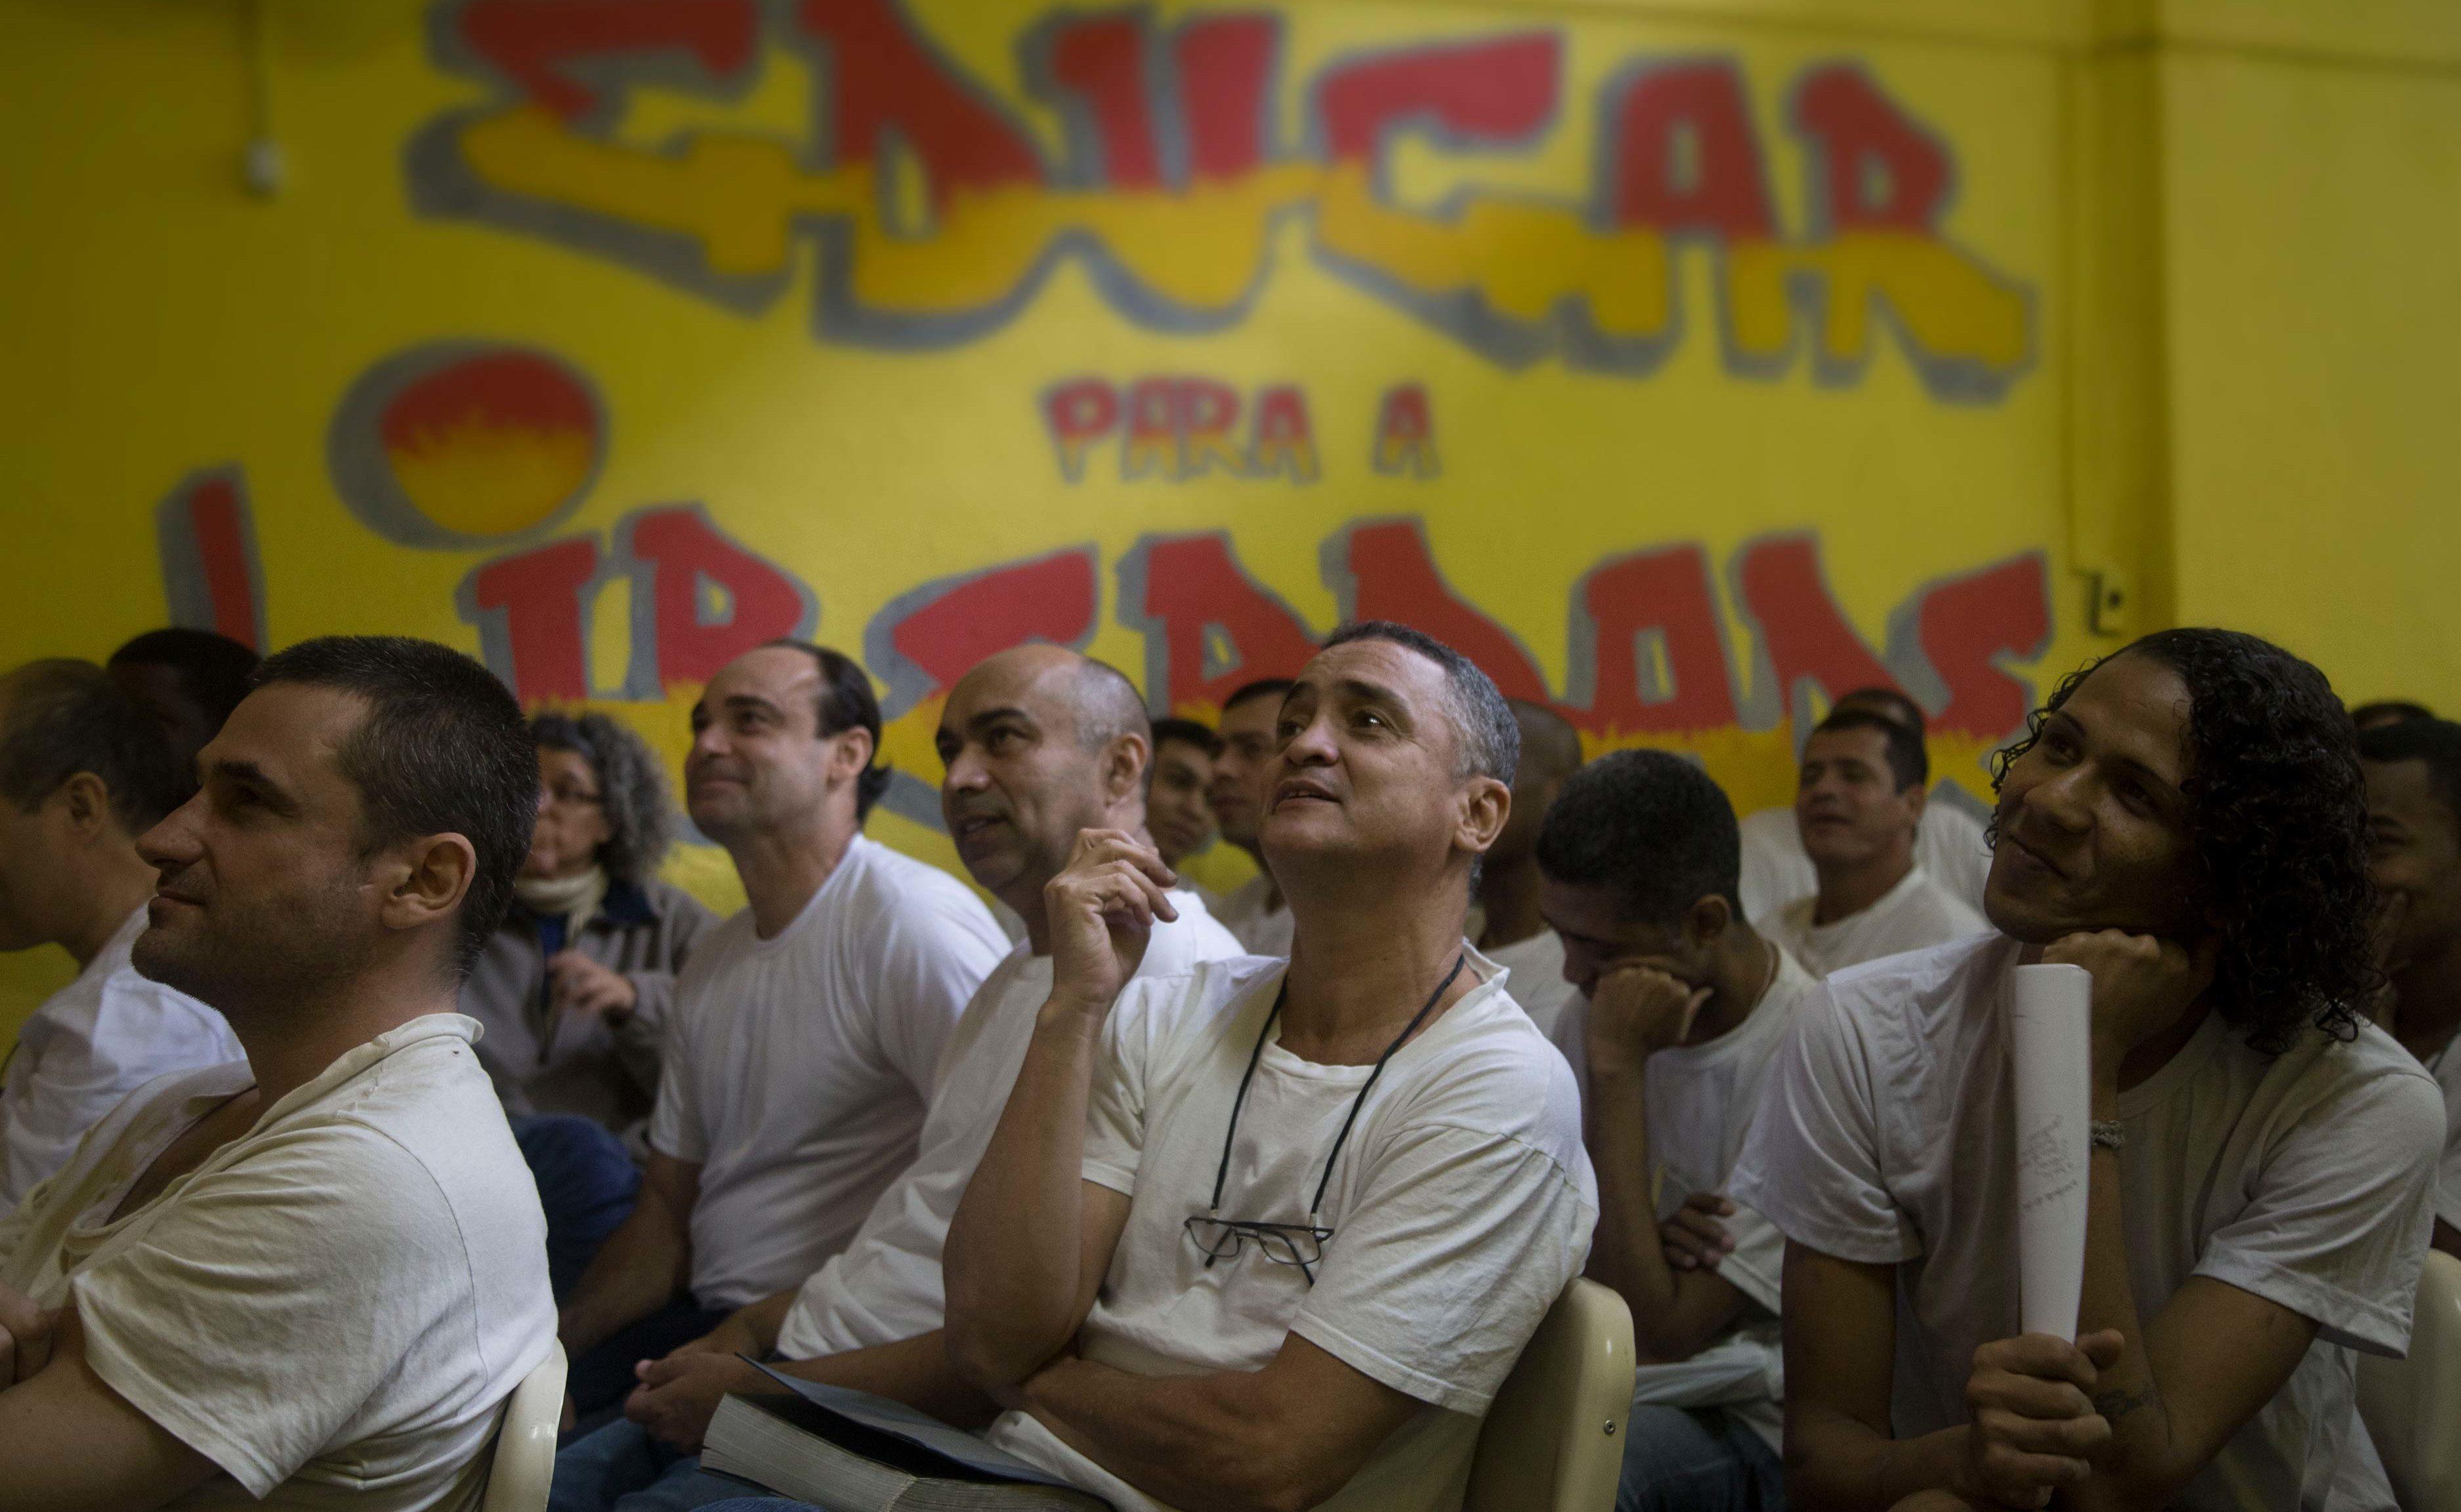 Prisoners at a men's penitentiary in Rio de Janeiro, Brazil, watch a performance by U-M associate professor Ashley Lucas. Photo: Levi Stroud